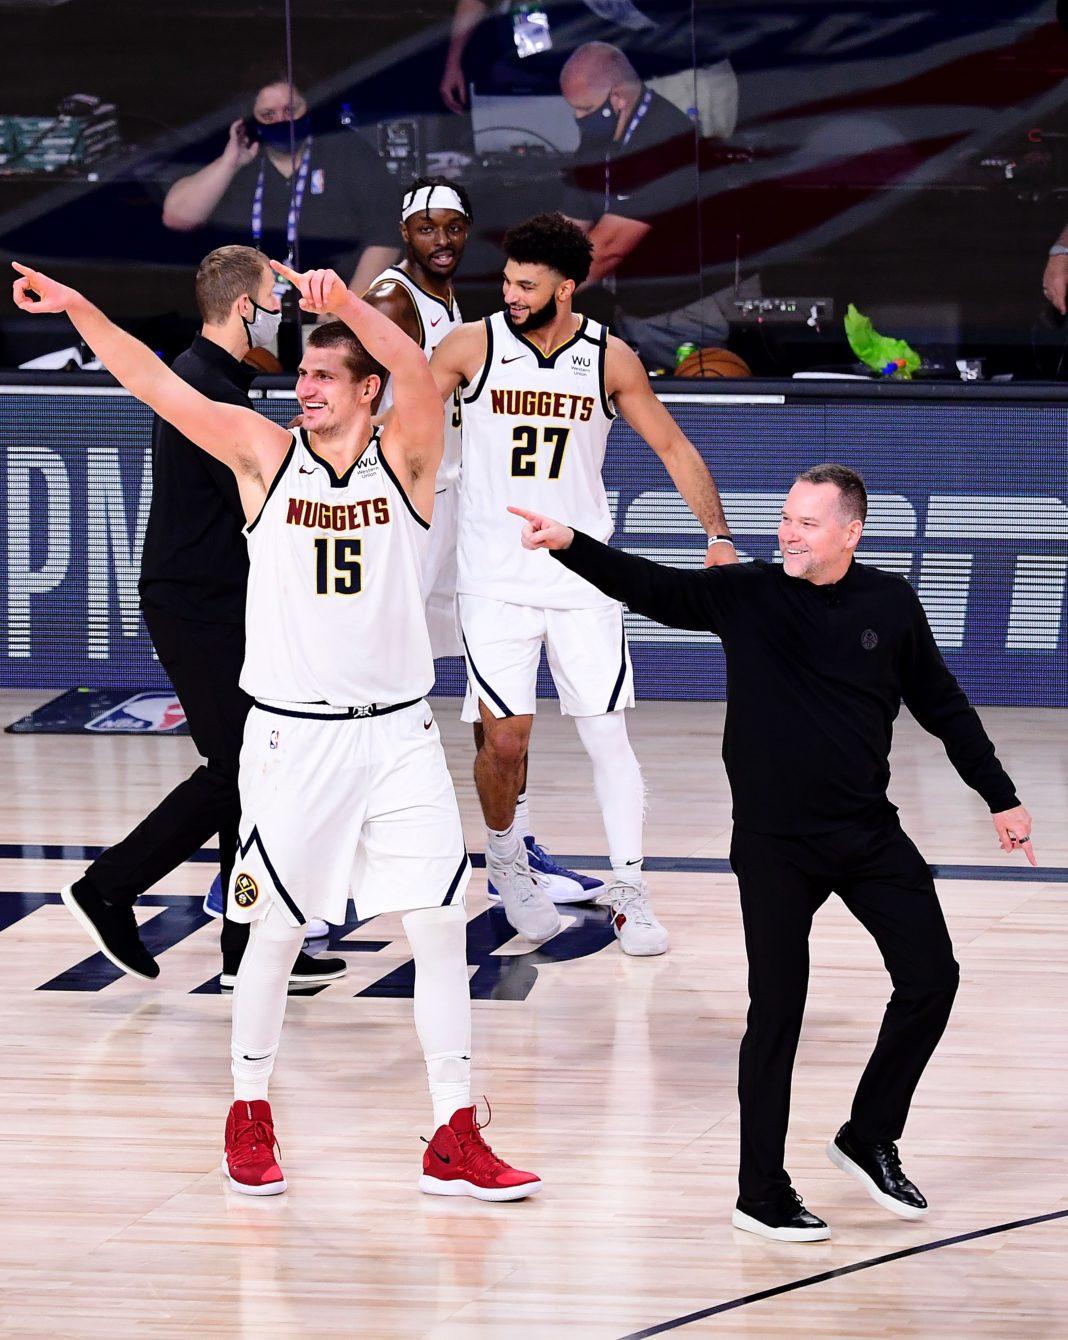 ISTORIJSKO VEČE: Neverovatni Jokić odveo Denver u finale konferencije NBA lige! (VIDEO) 1